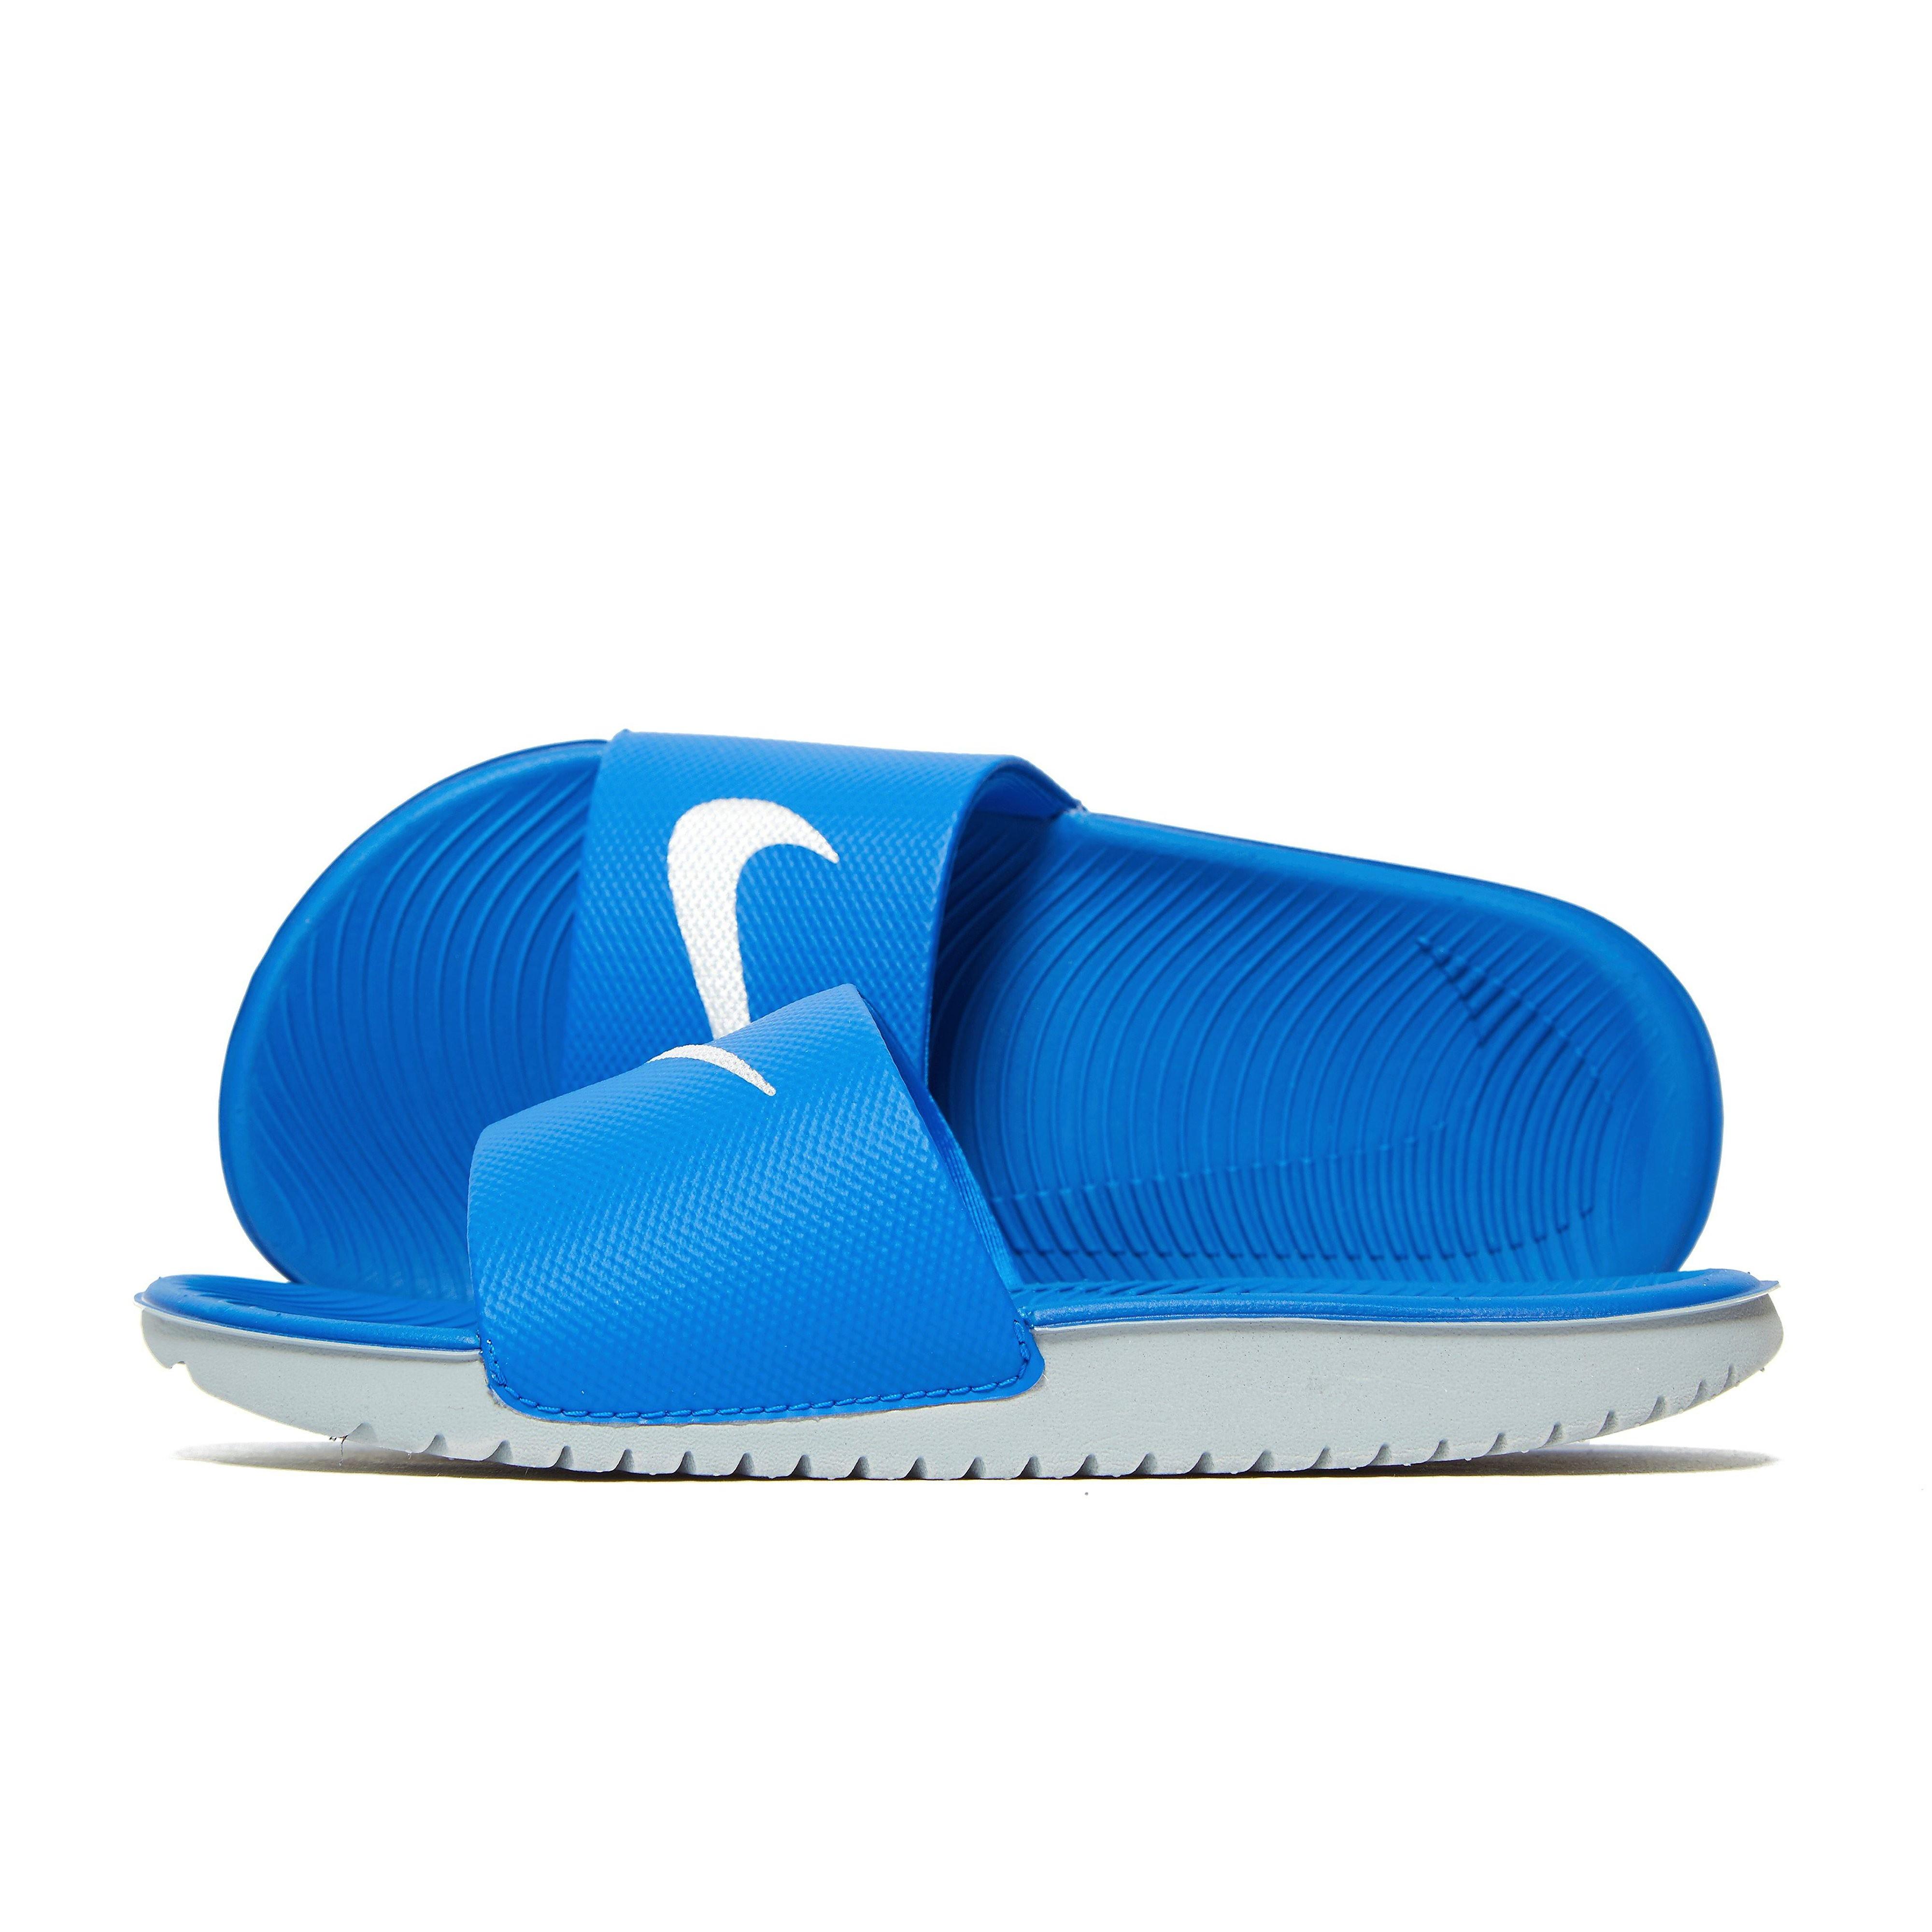 Nike Kawa Junior Slide Walking Sandals